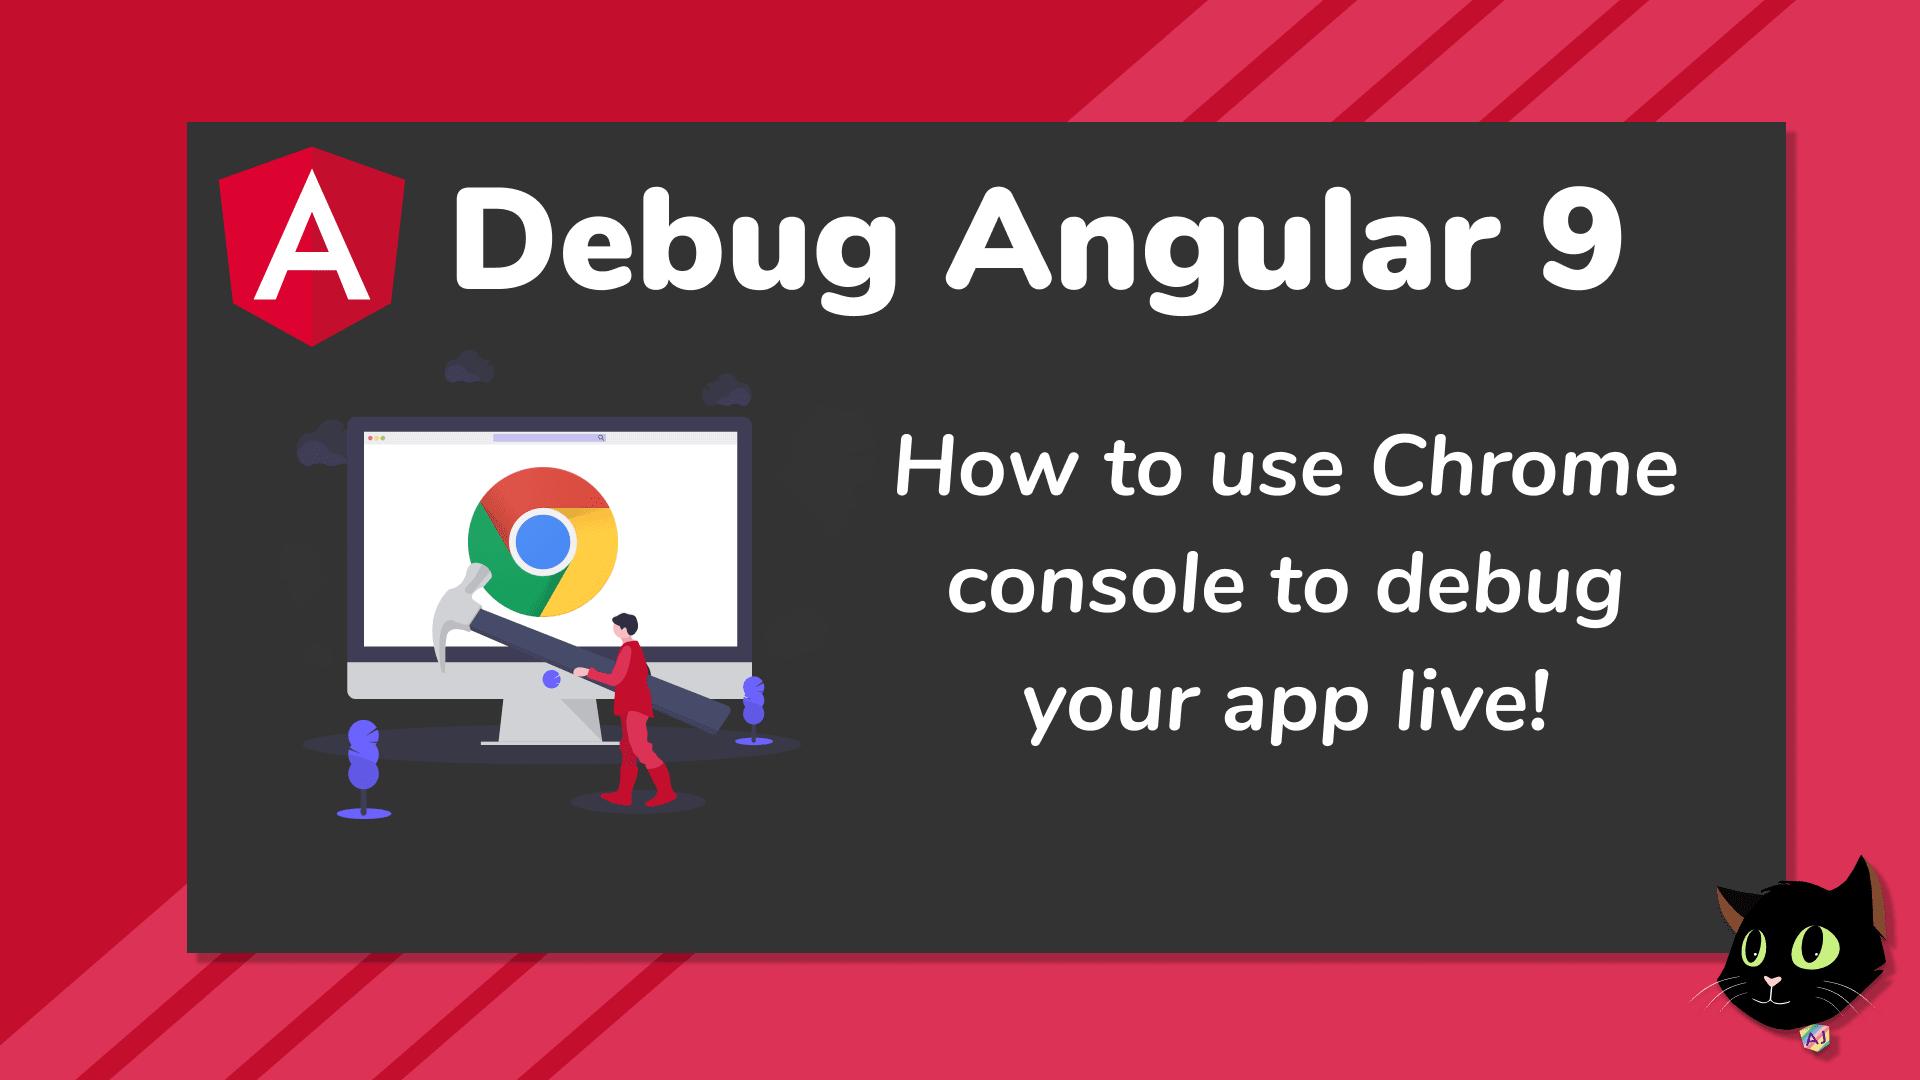 Debug Angular 9 in Chrome Console